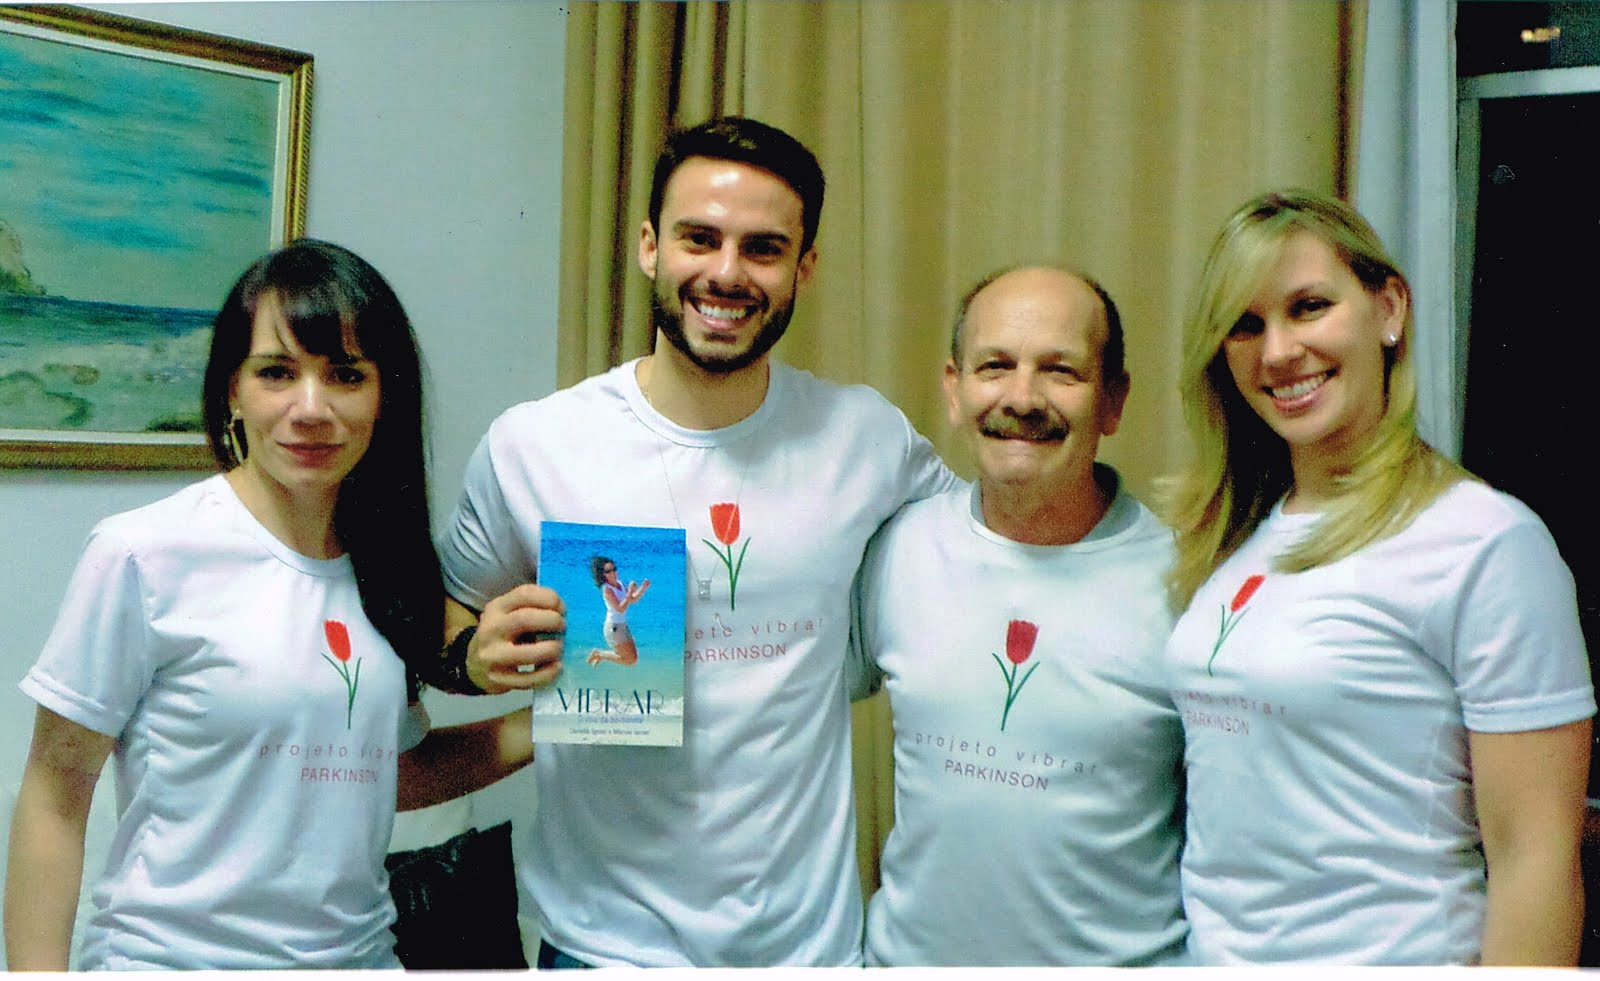 Manoel Ianzer Poesias - apoia o Projeto Vibrar Parkinson